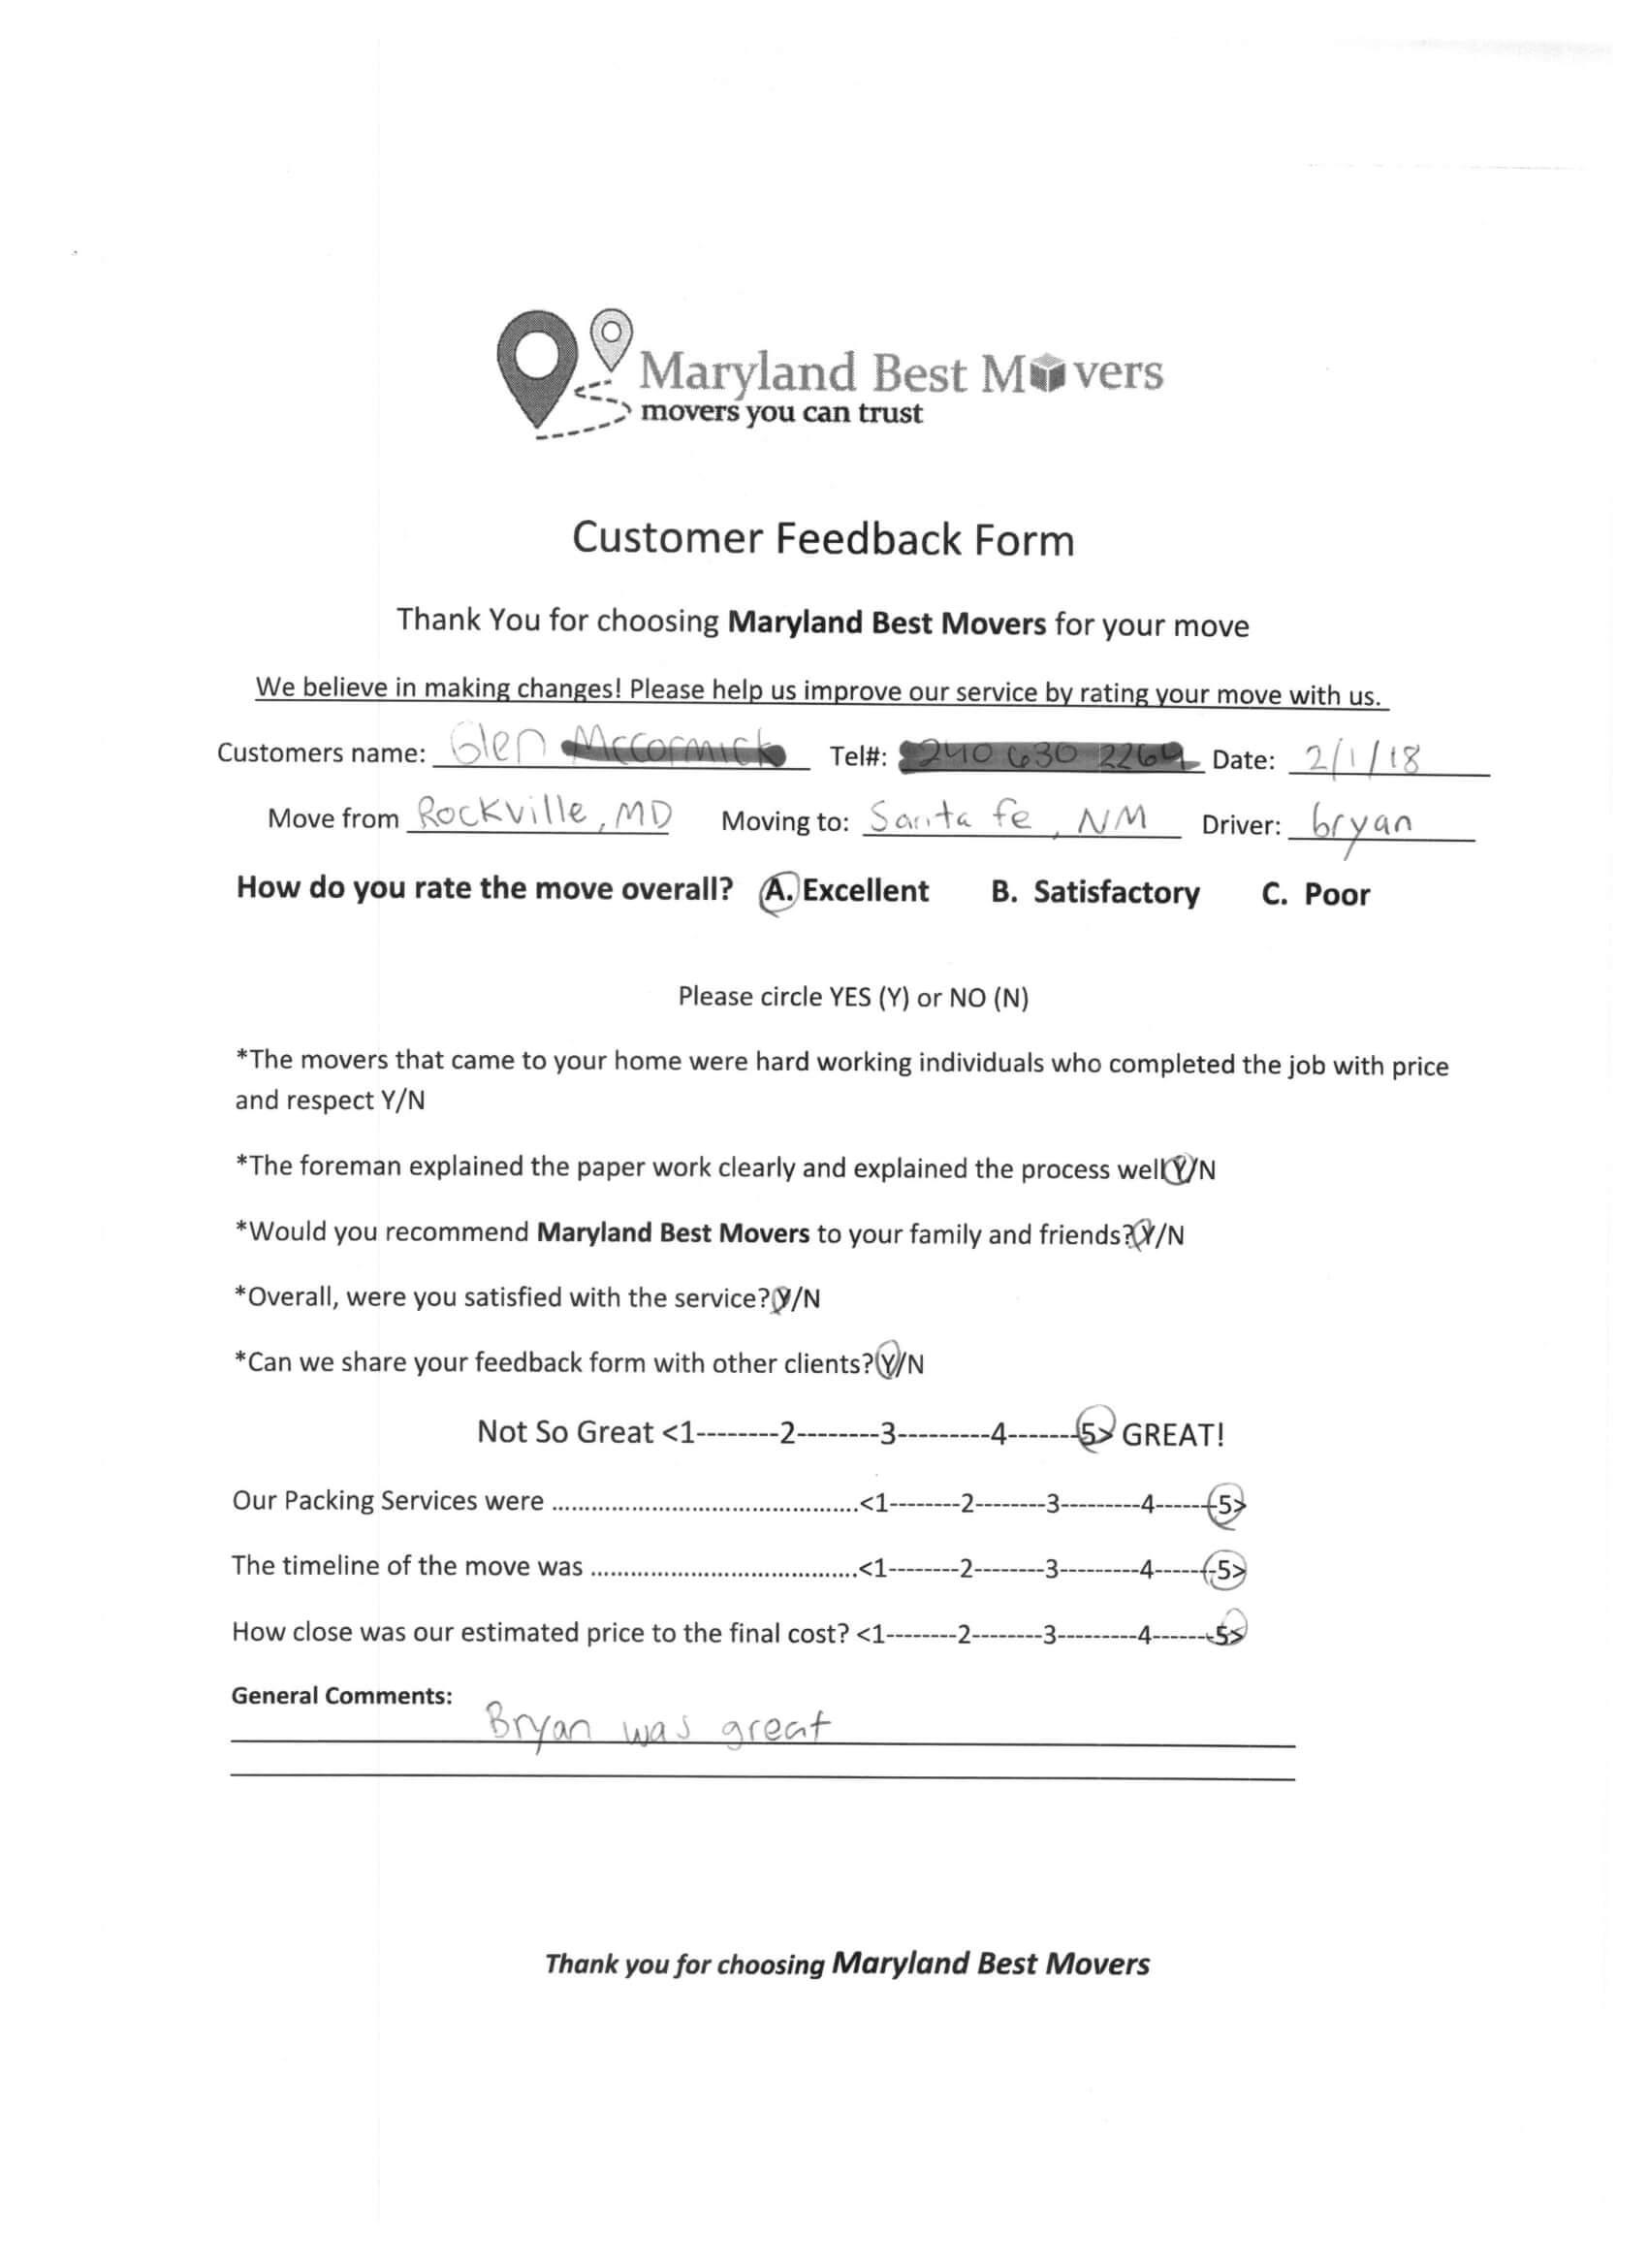 Maryland feedback forms-3